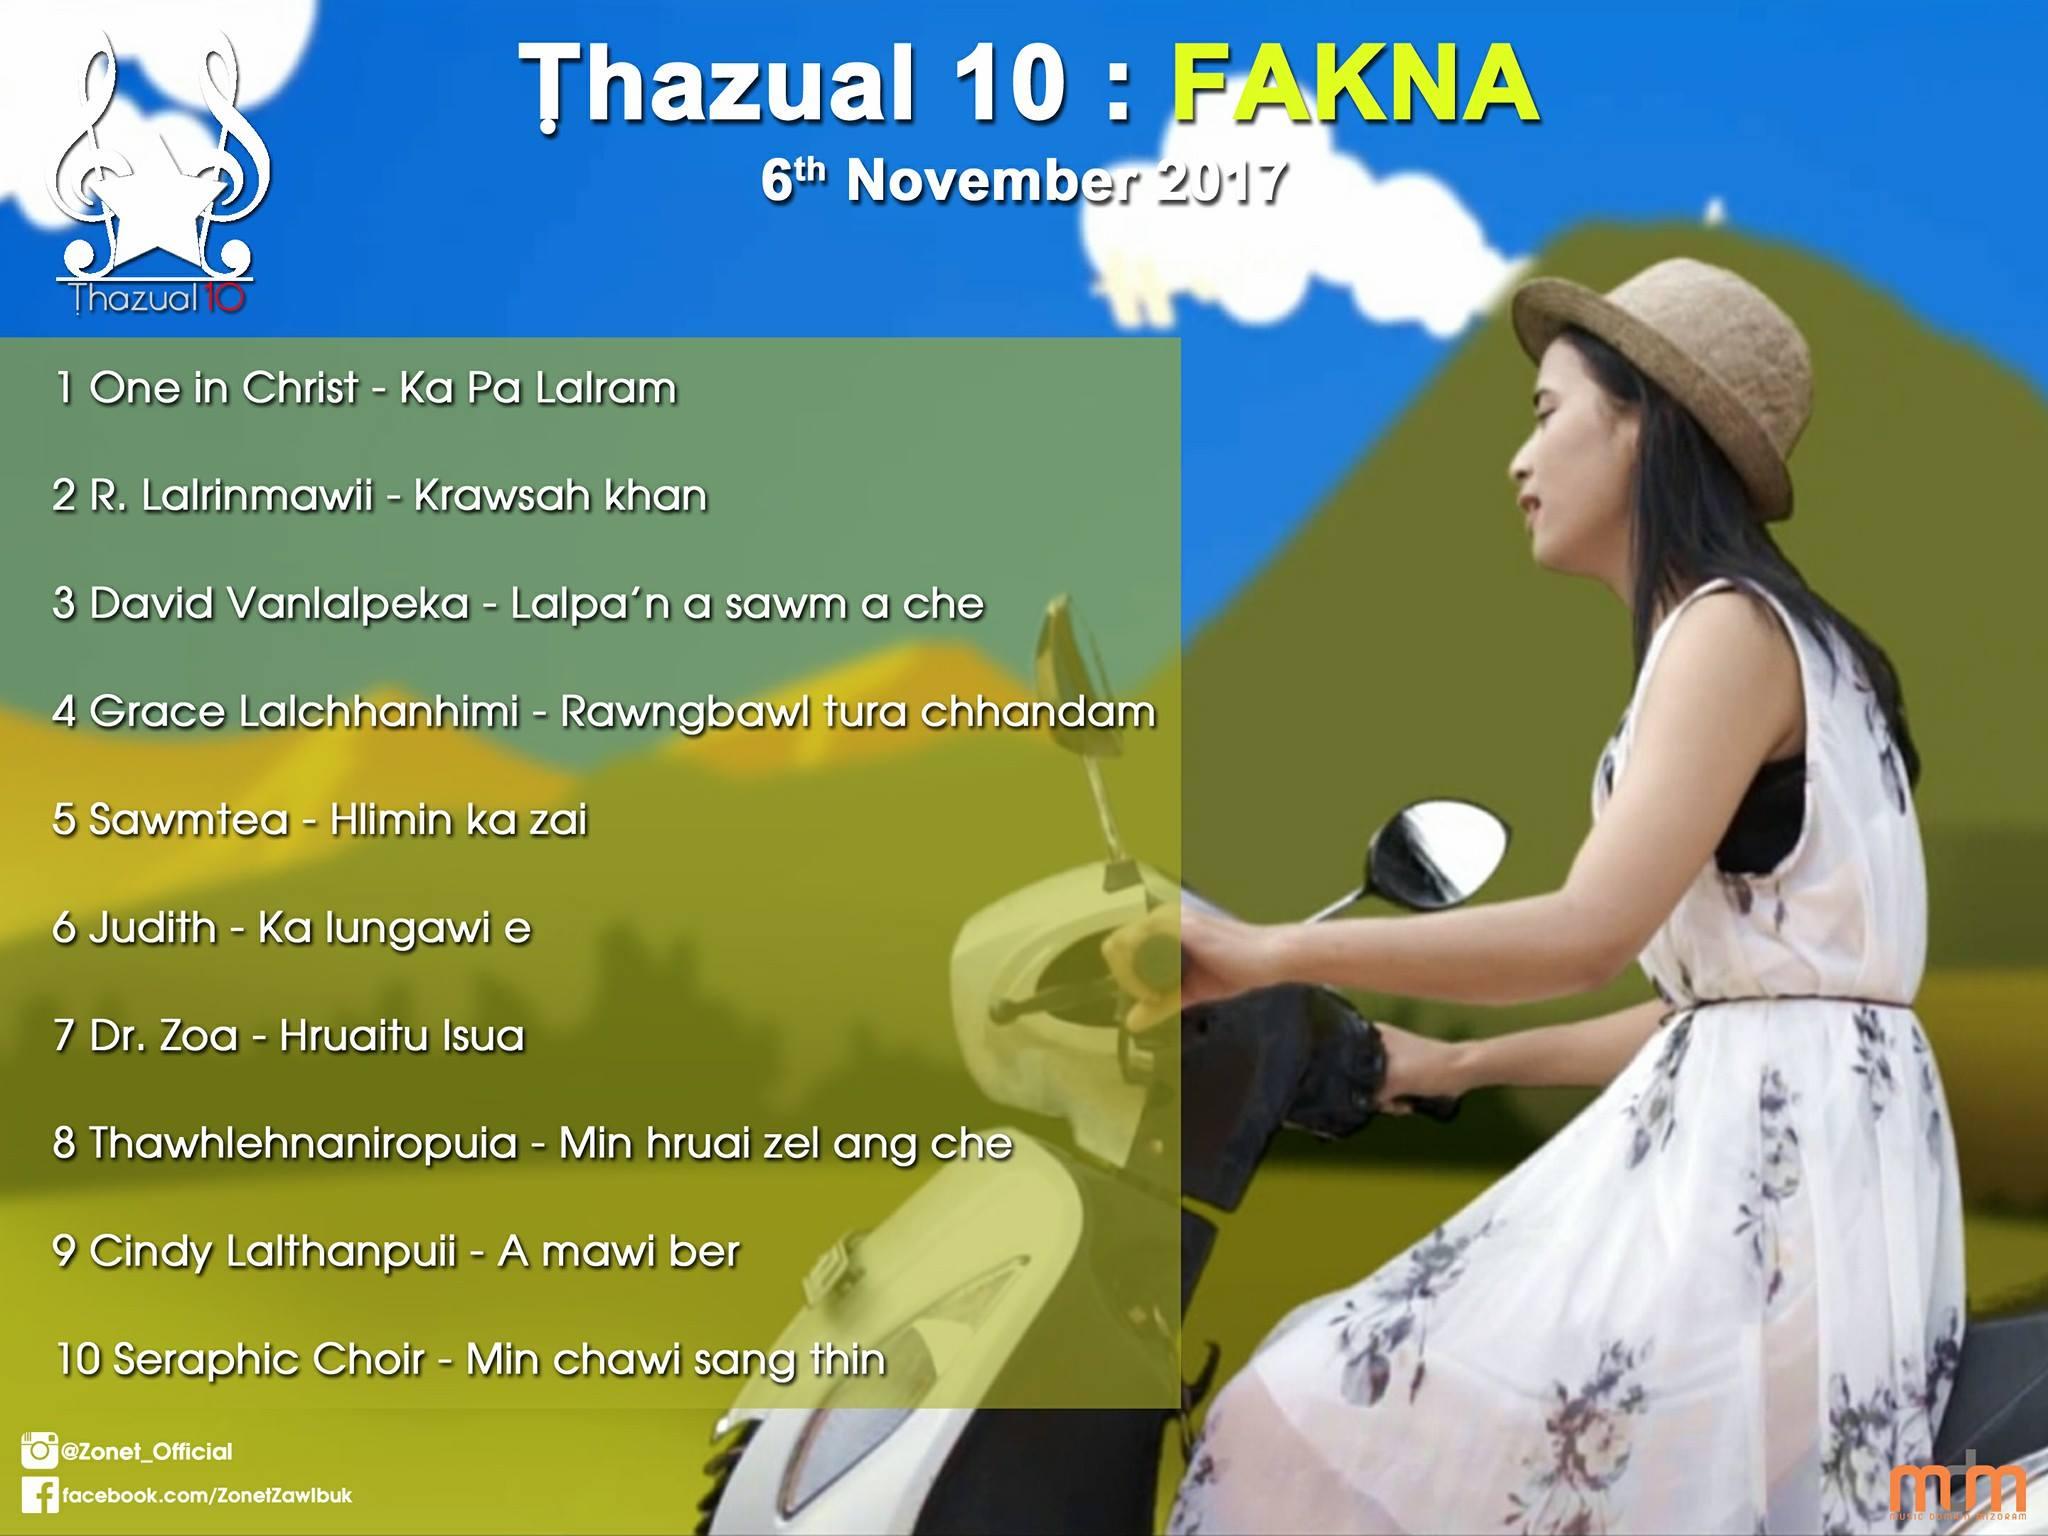 THAZUAL 10 (FAKNA) 6th November 2017: Tun kar chart-ah One In Christ pakhatna an ni